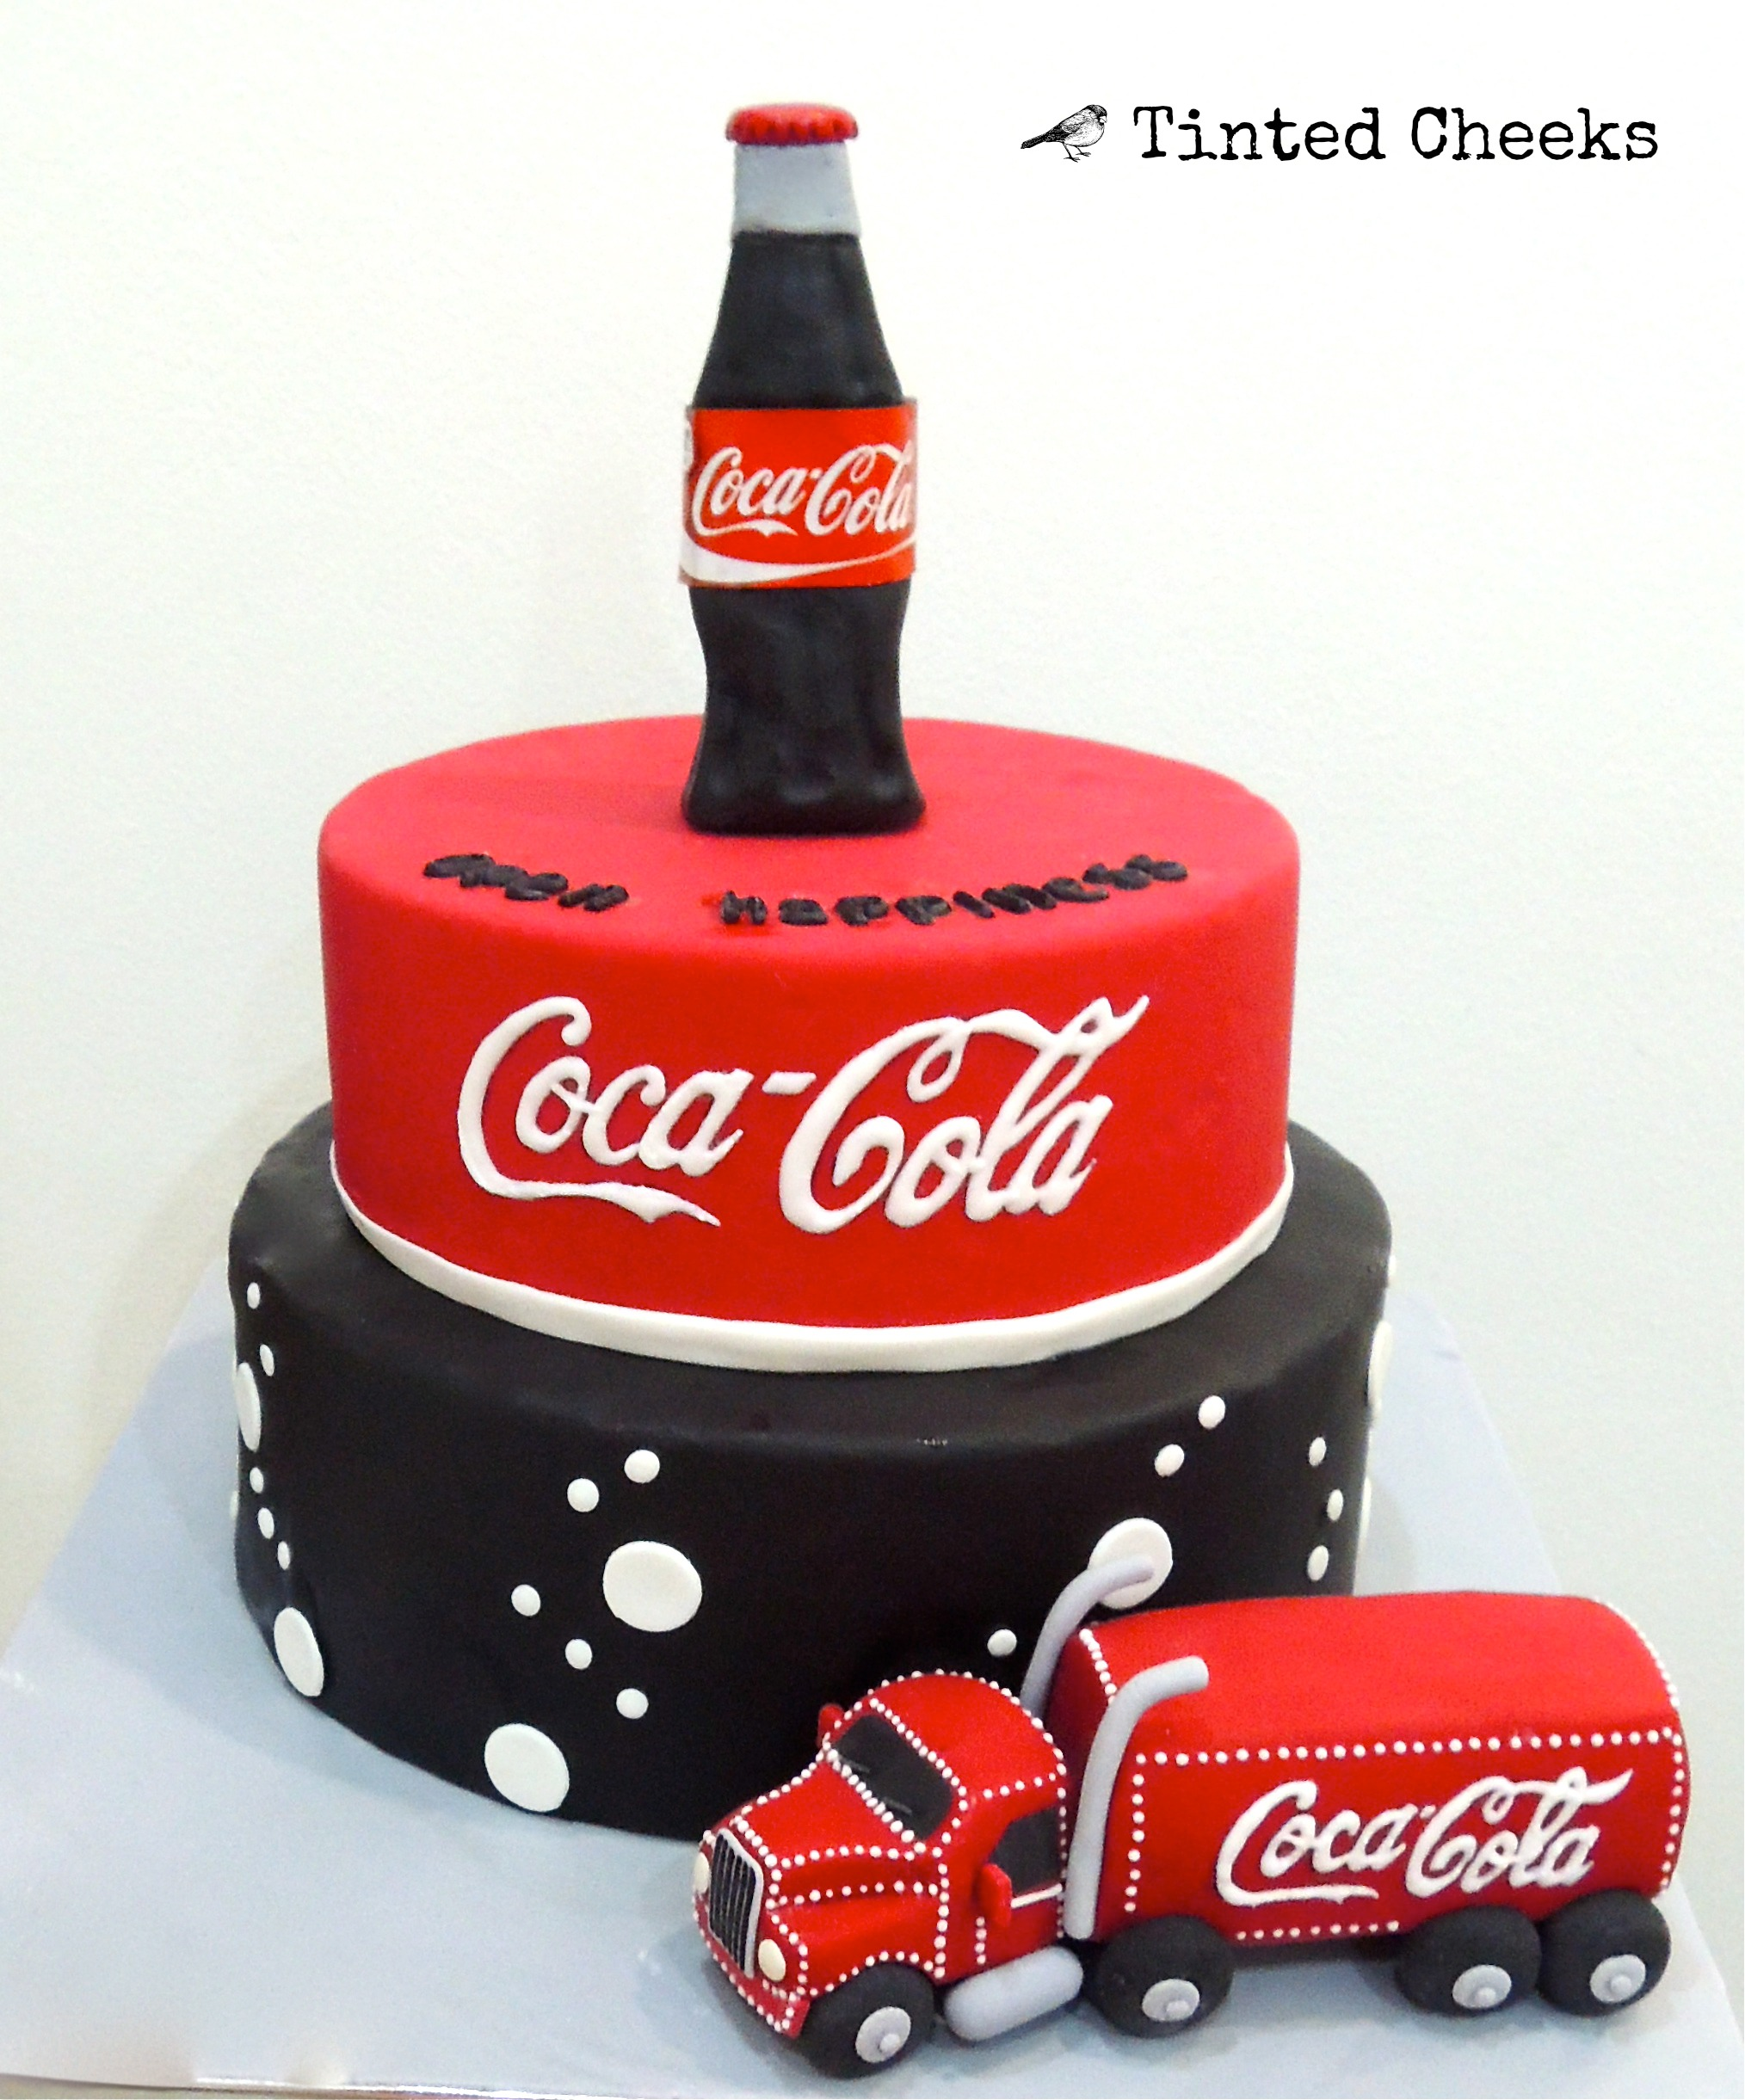 Coca Cola Company Cake (2014).jpg